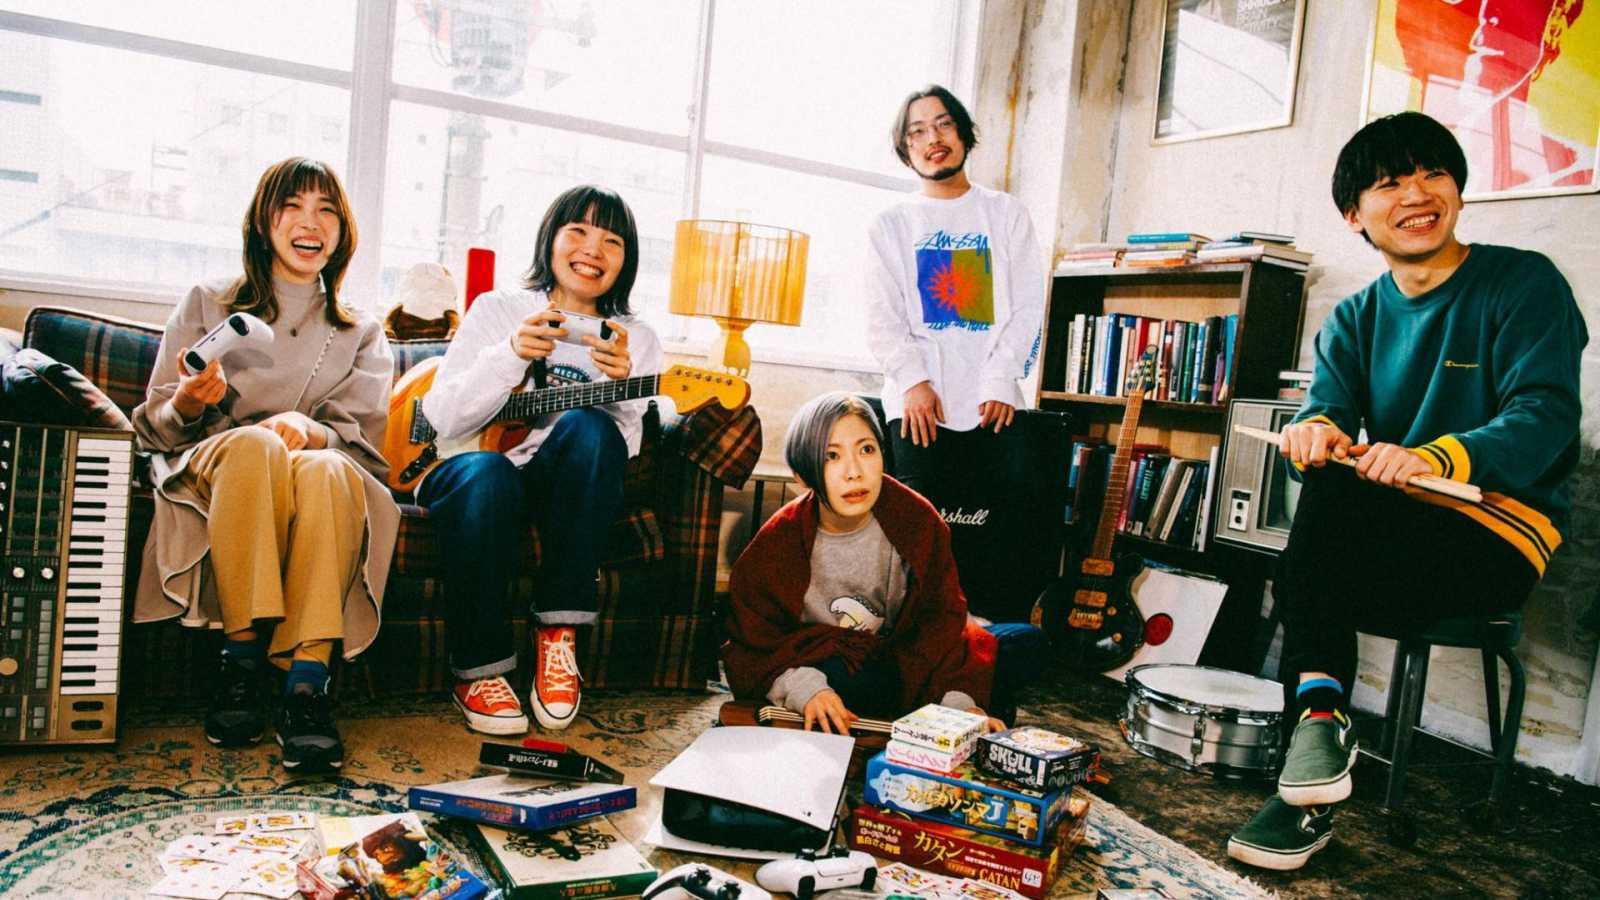 Lisätietoja Necry Talkien tulevasta albumista © Necry Talkie. All rights reserved.